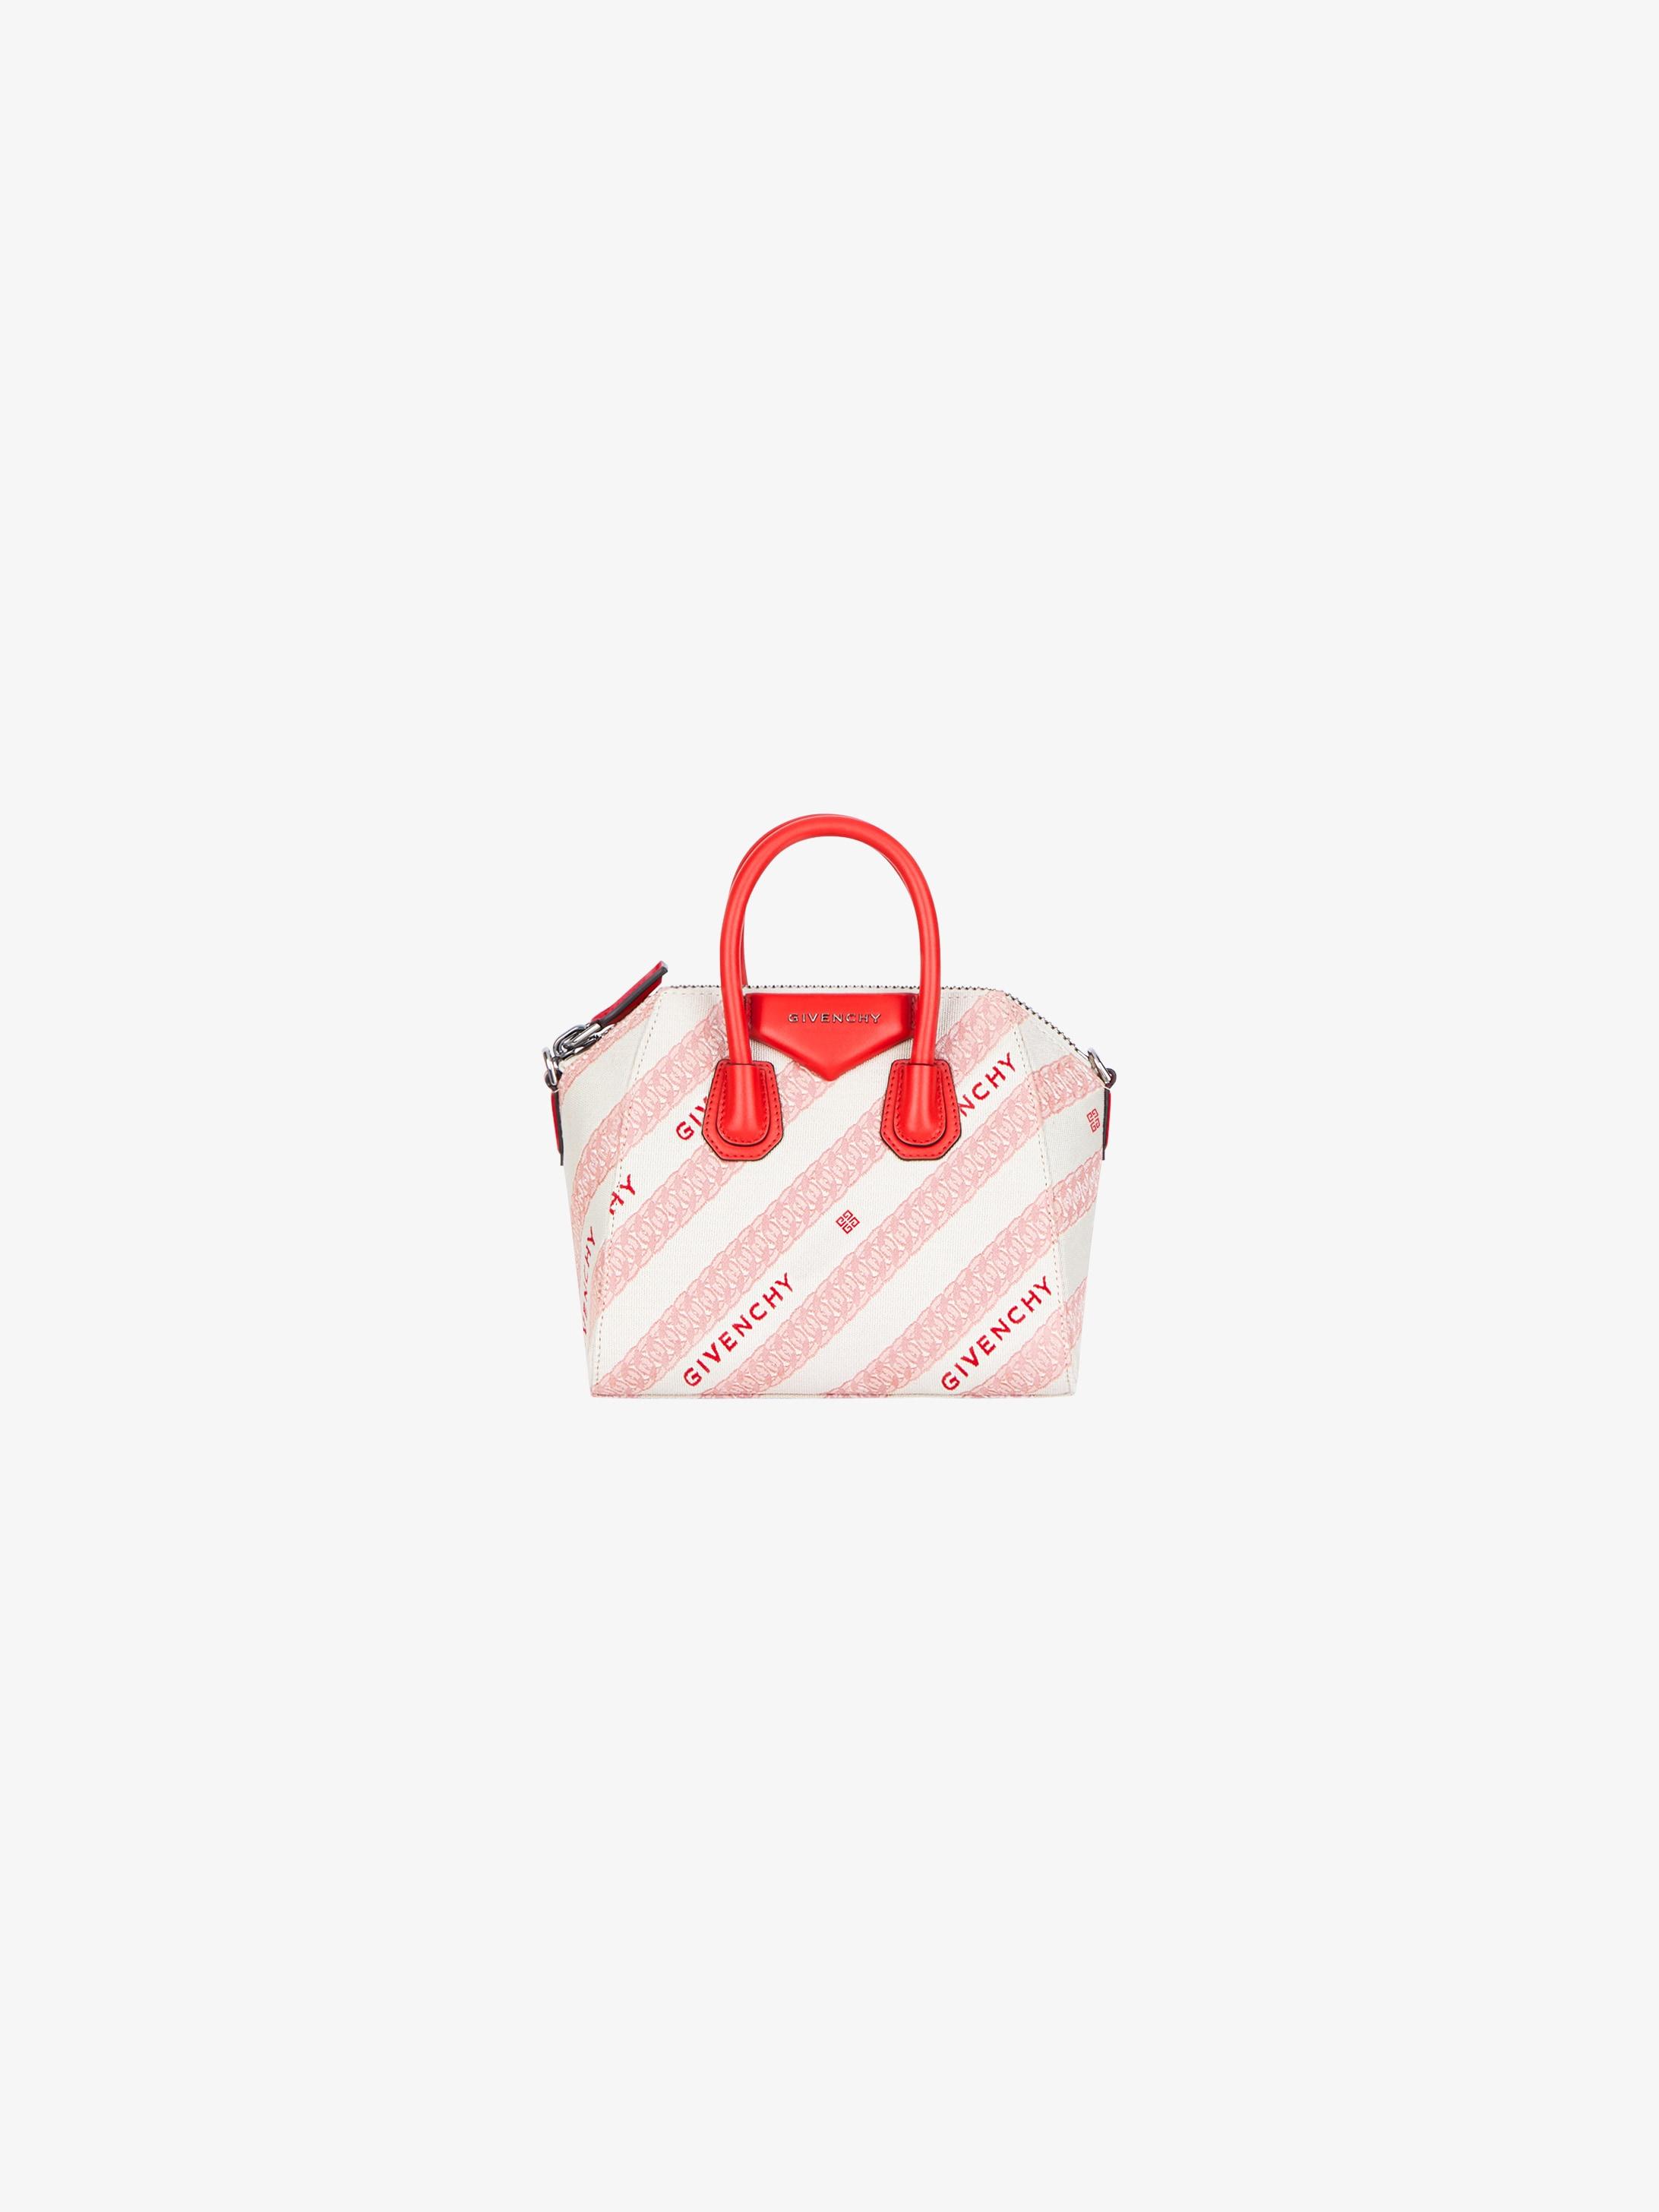 Mini Antigona bag in GIVENCHY jacquard chain and leather